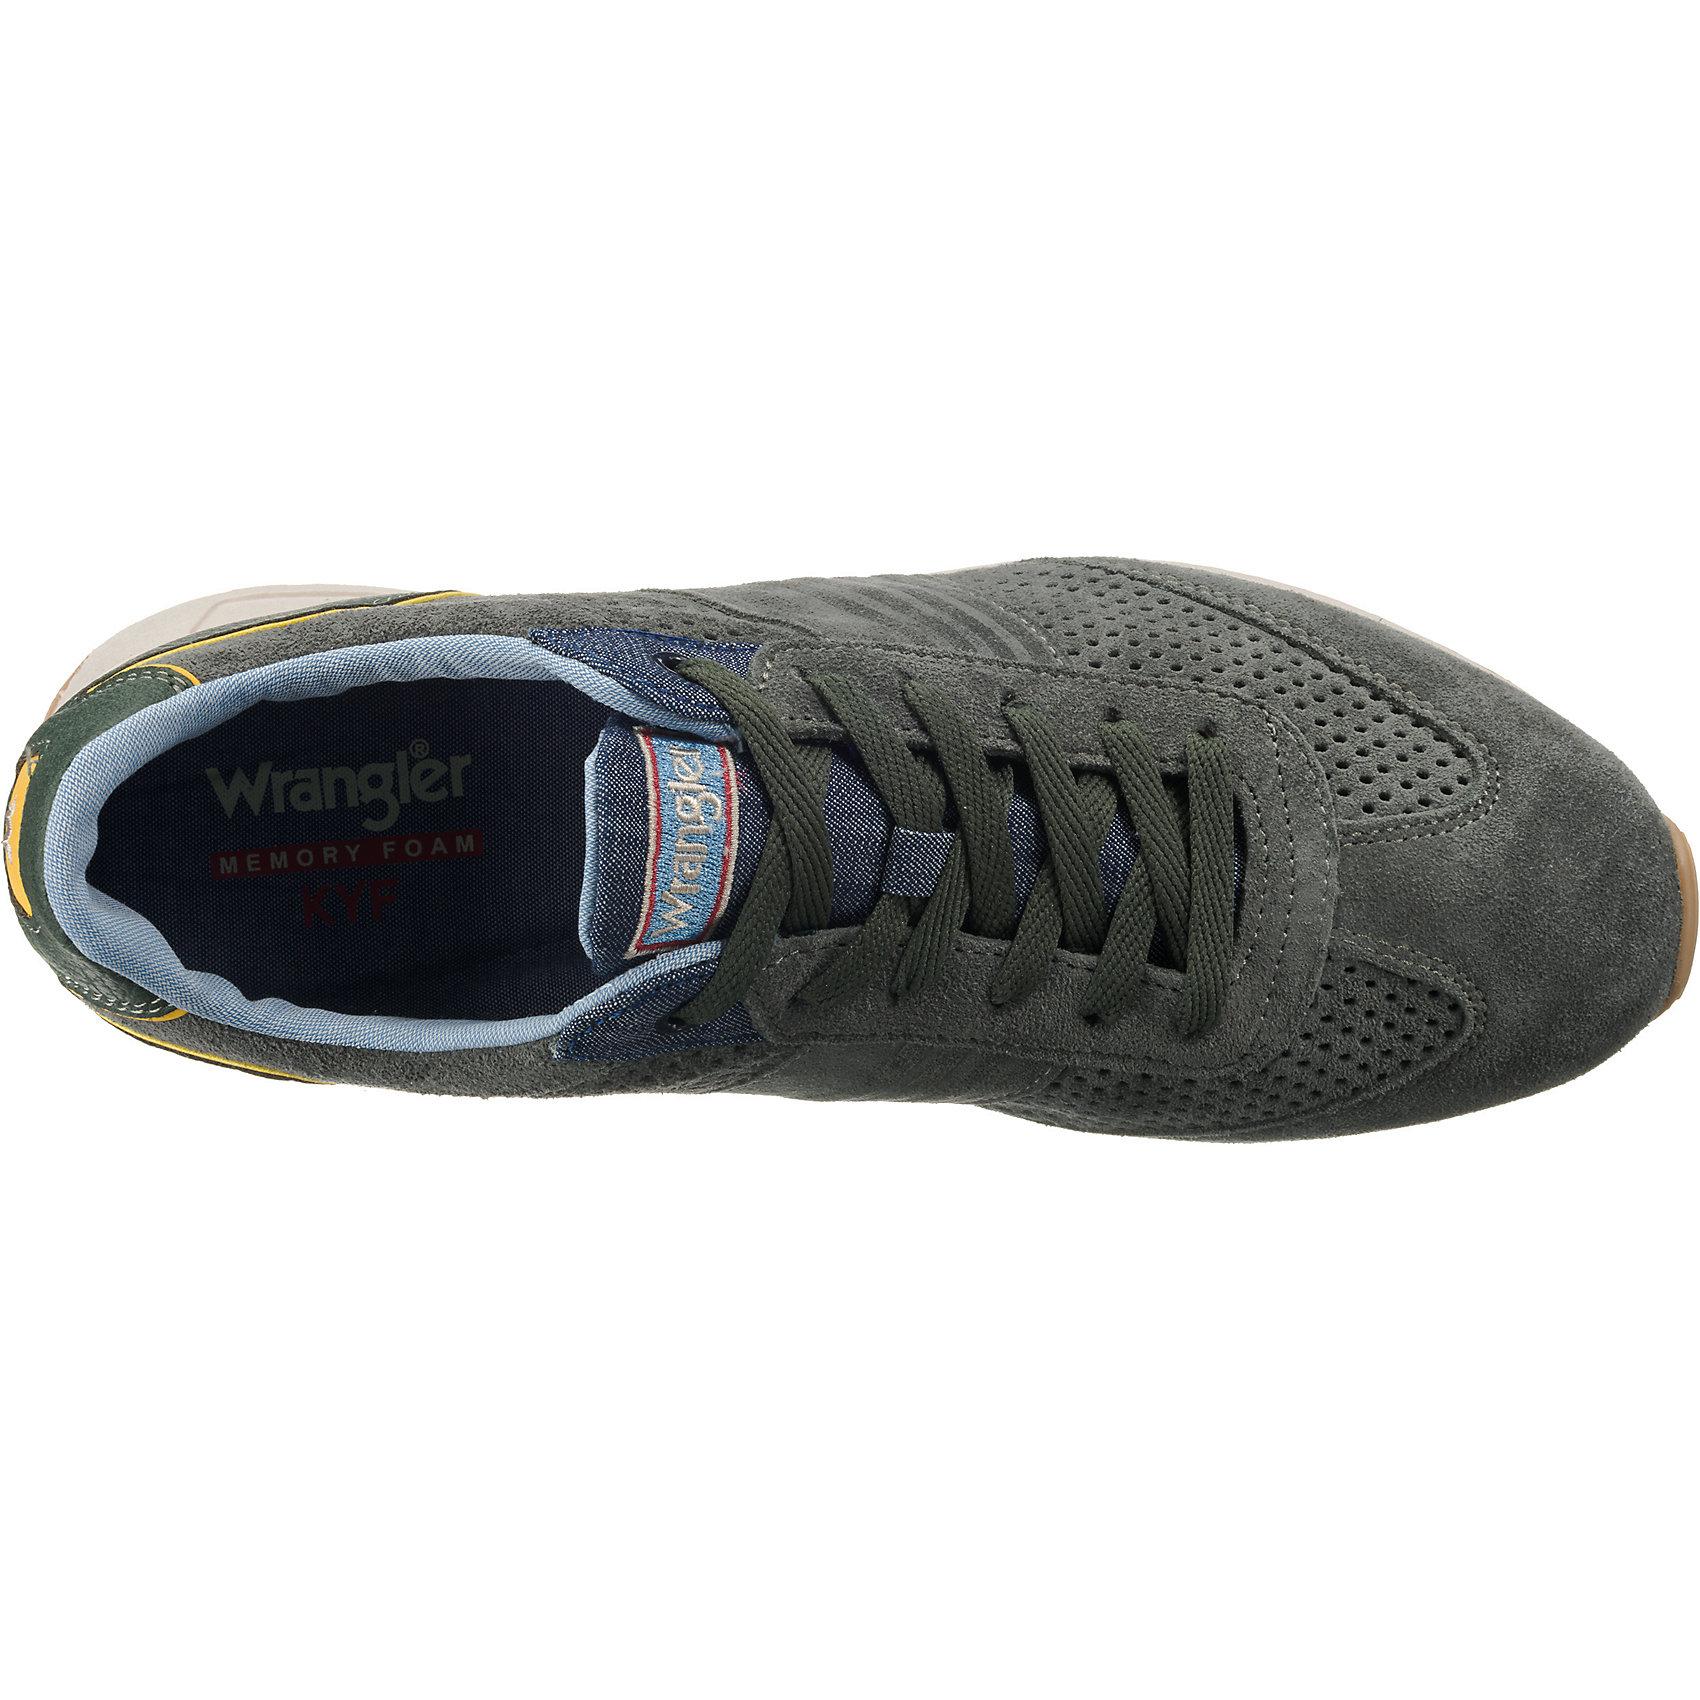 Neu Wrangler für Beyond City Sneakers 7536664 ... für Wrangler Herren ... 7536664 115f5d